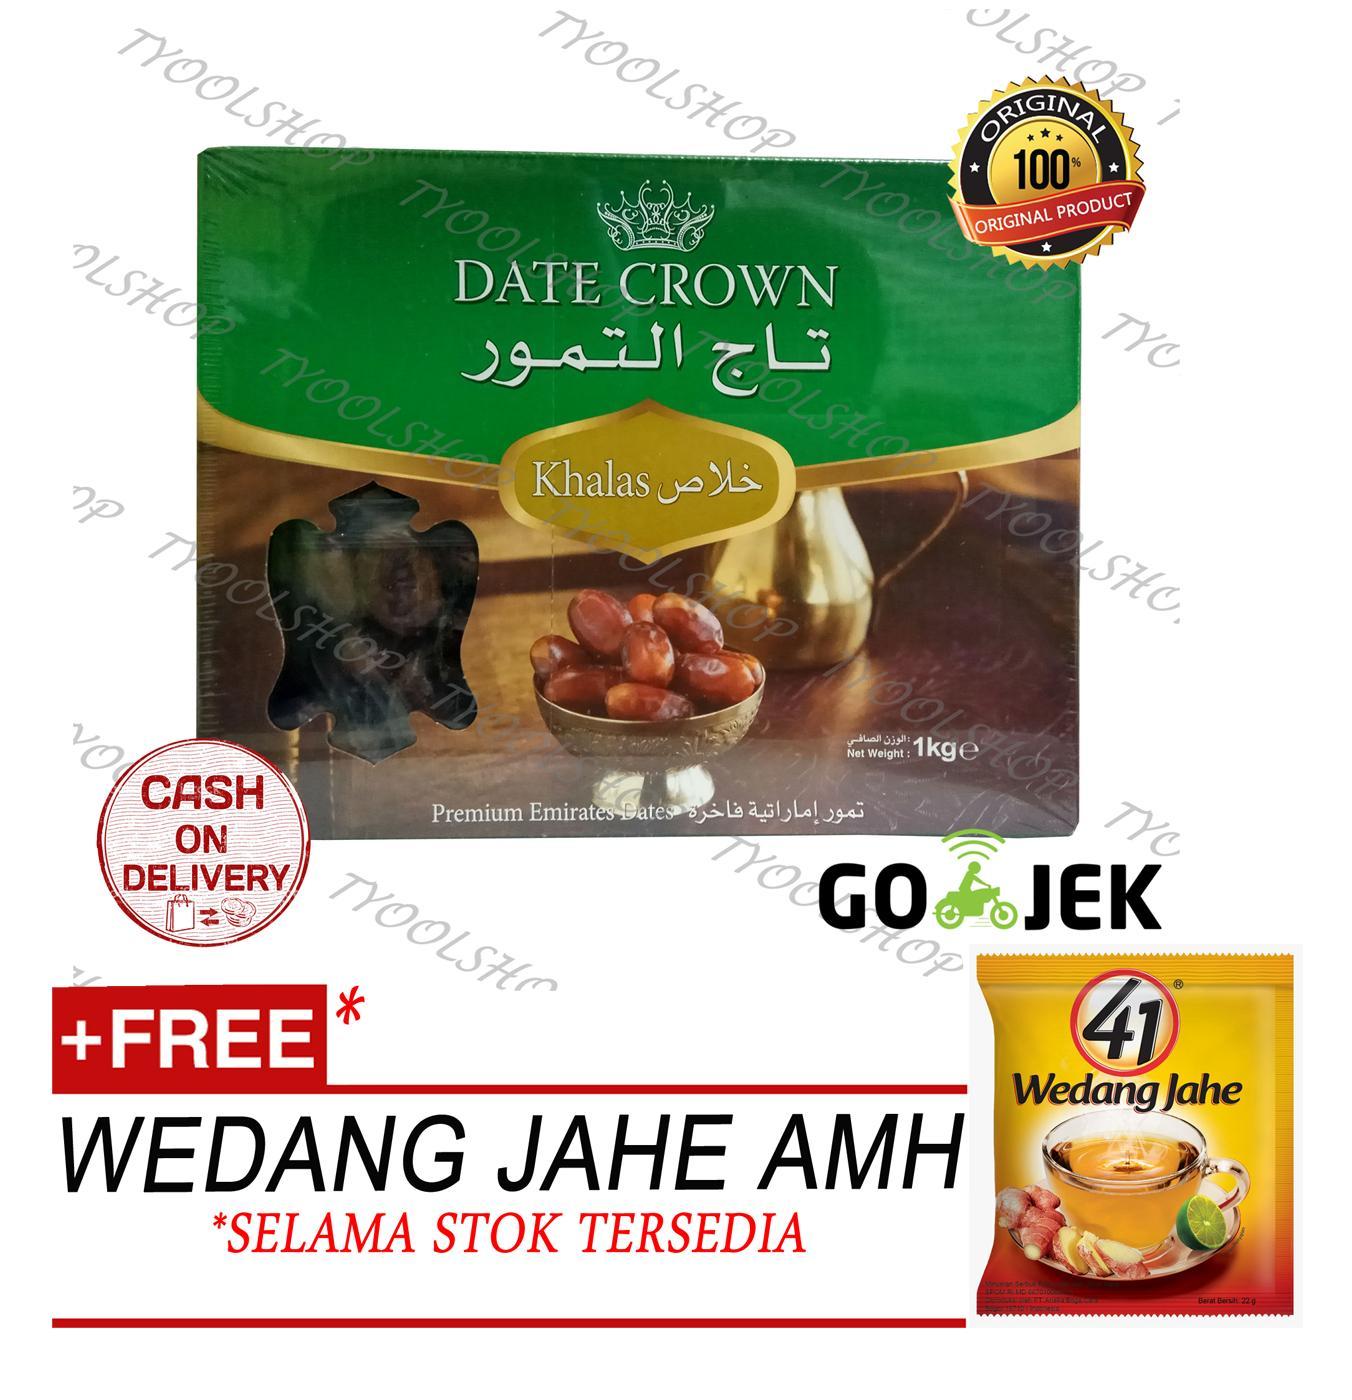 Kurma Date Crown Kurma Khalas -1 kg + Wedang Jahe*